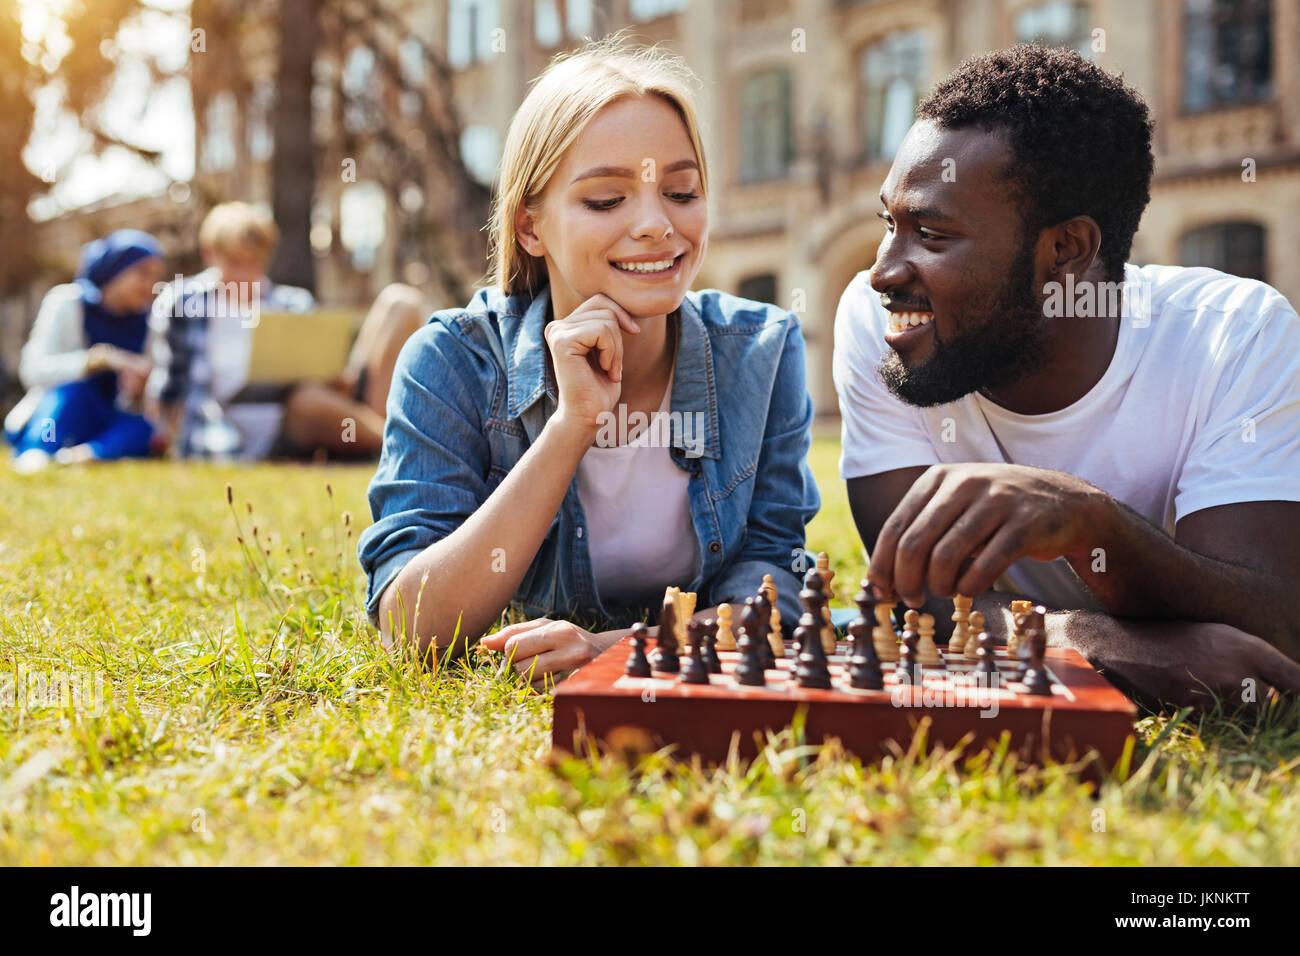 Positiven hübsche Frau unterrichten ihre Freundin spielt Schach Stockbild